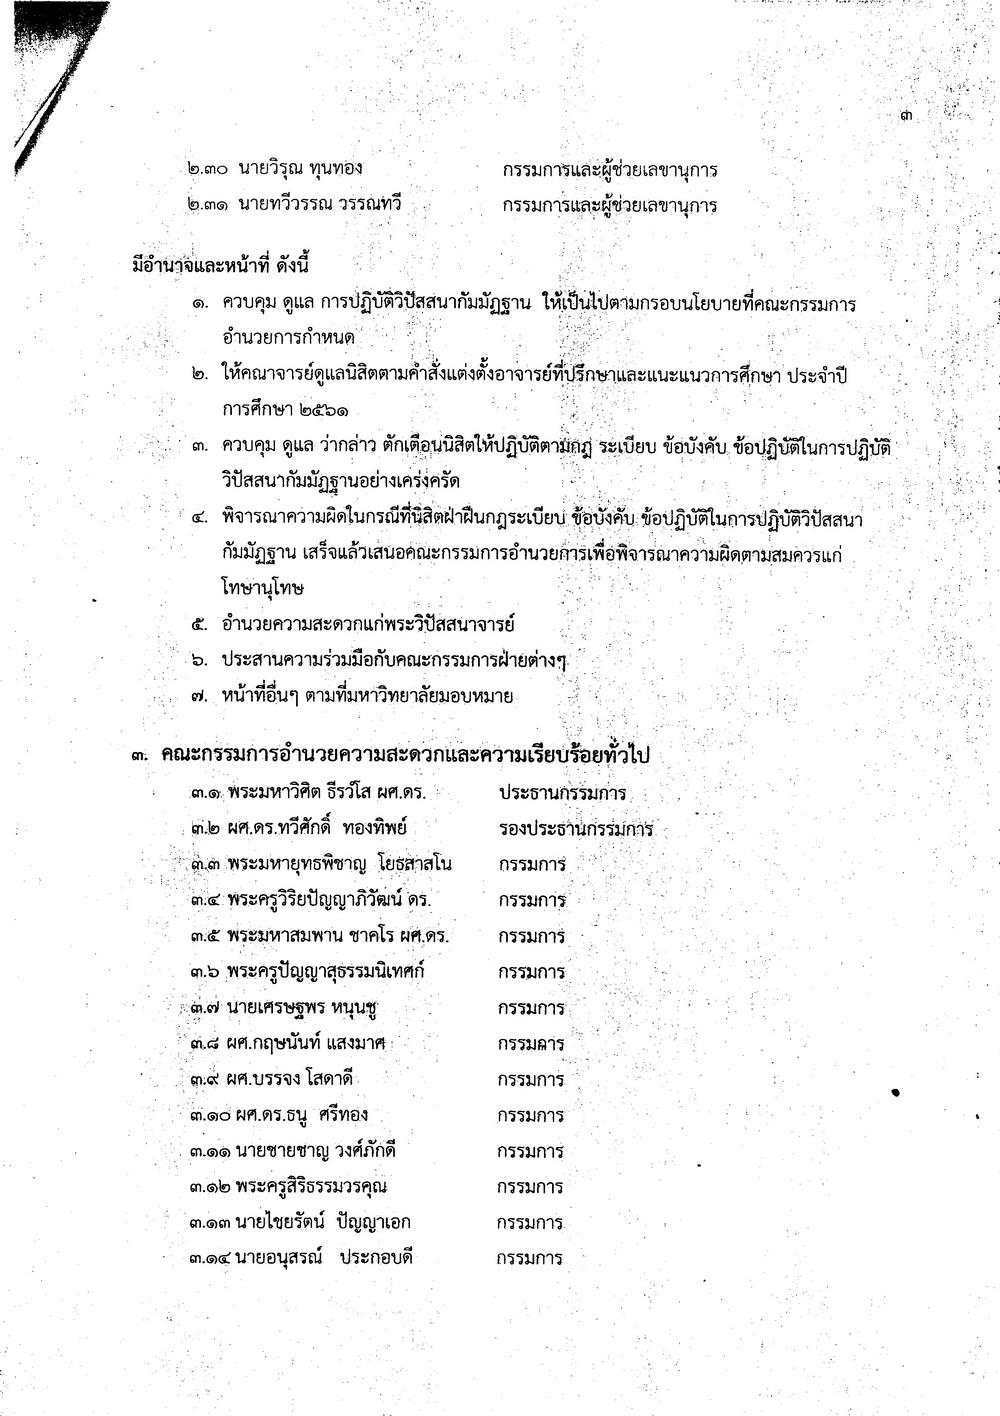 OrderDM61_0003